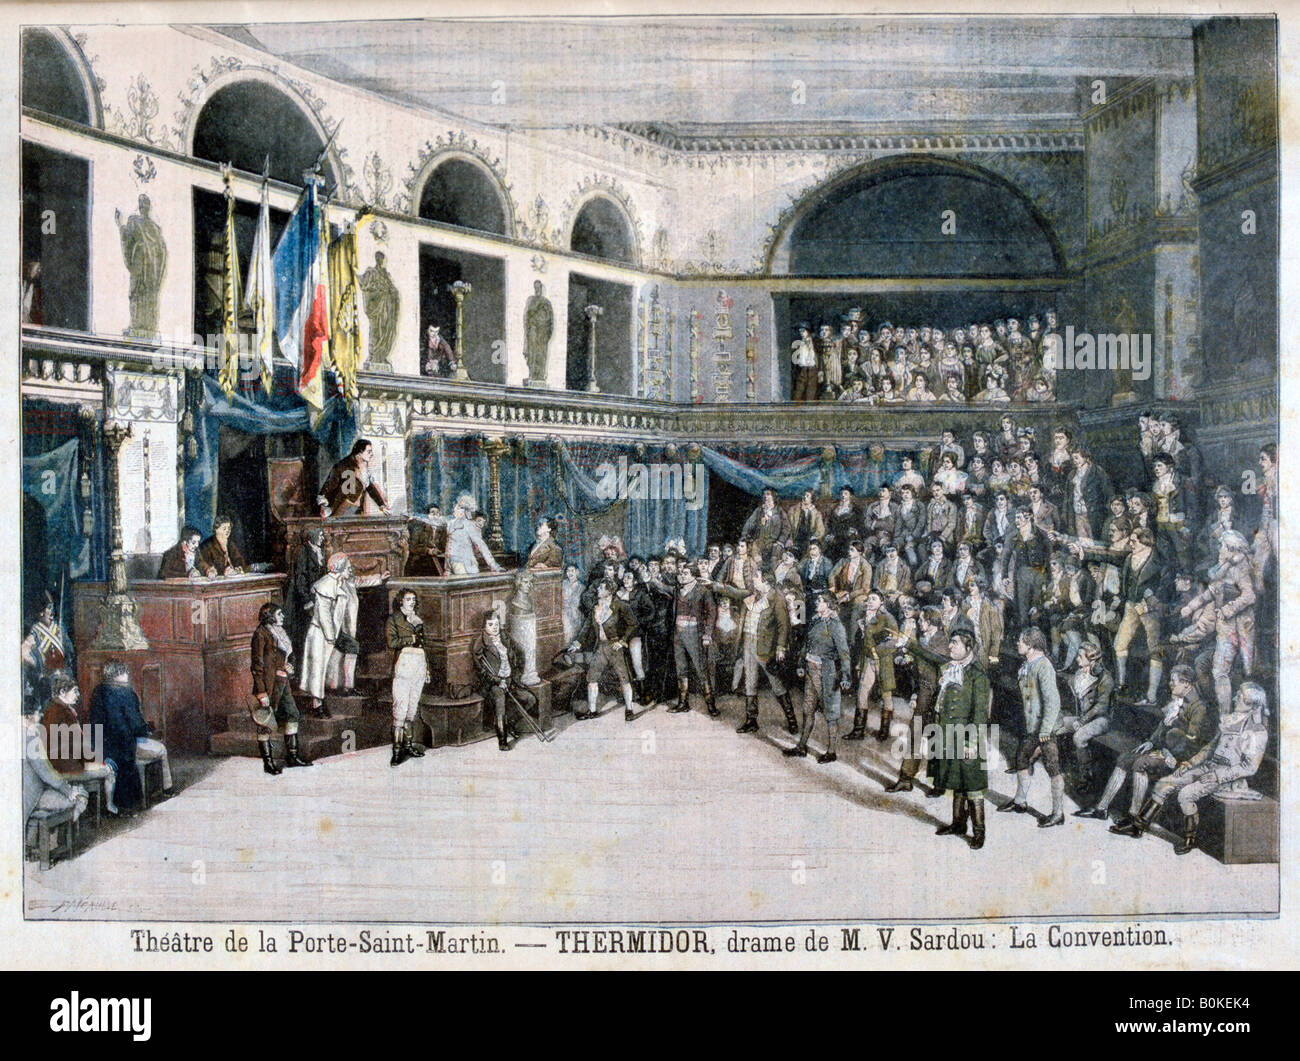 Scene from theatre performance stock photos scene from - Theatre de la porte saint martin 75010 paris ...